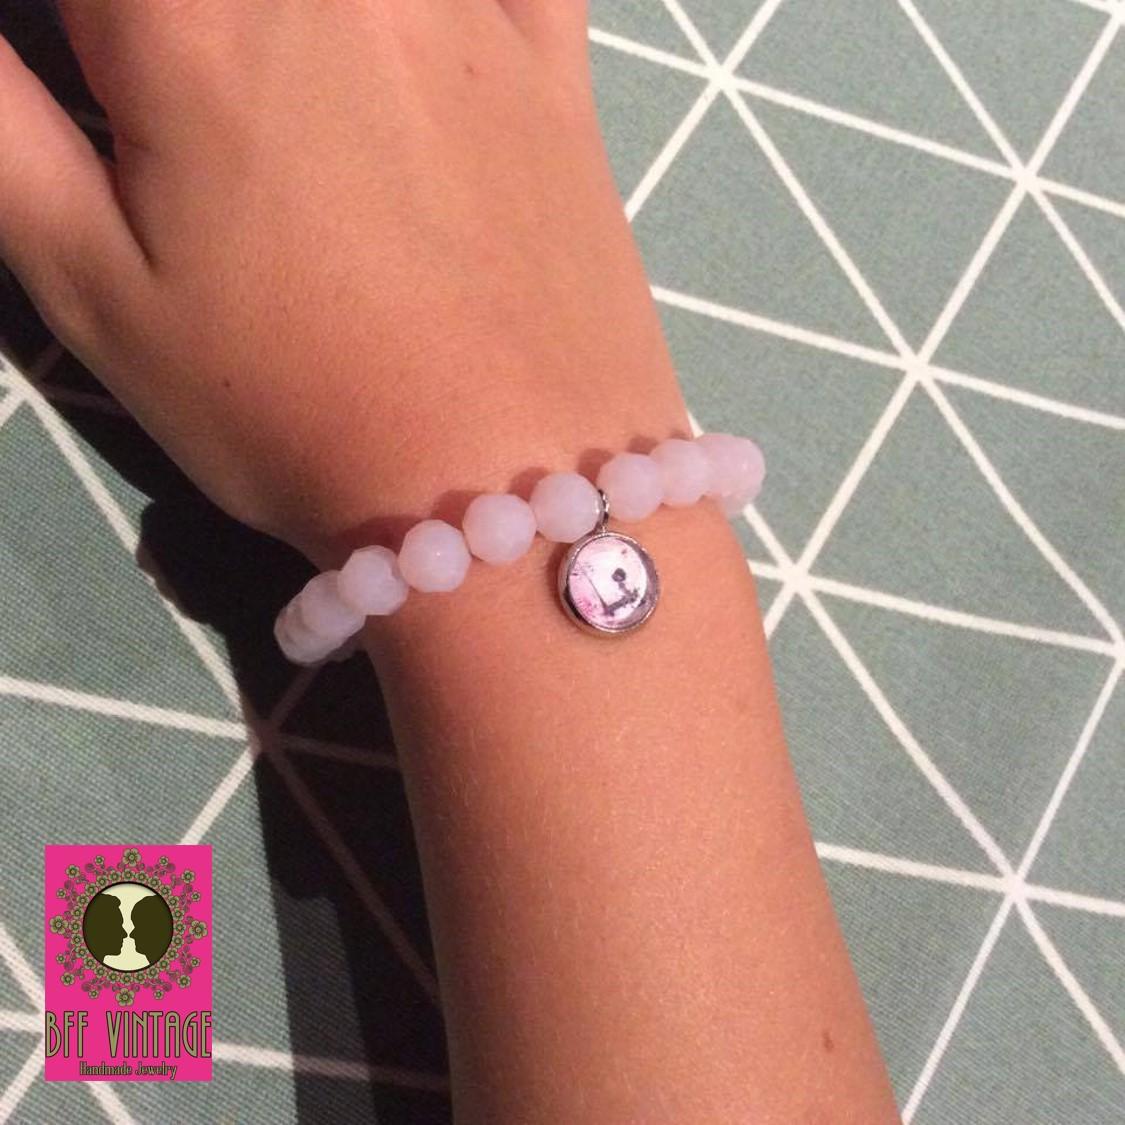 BFF roze glaskralenarmband met cabochonhangertje